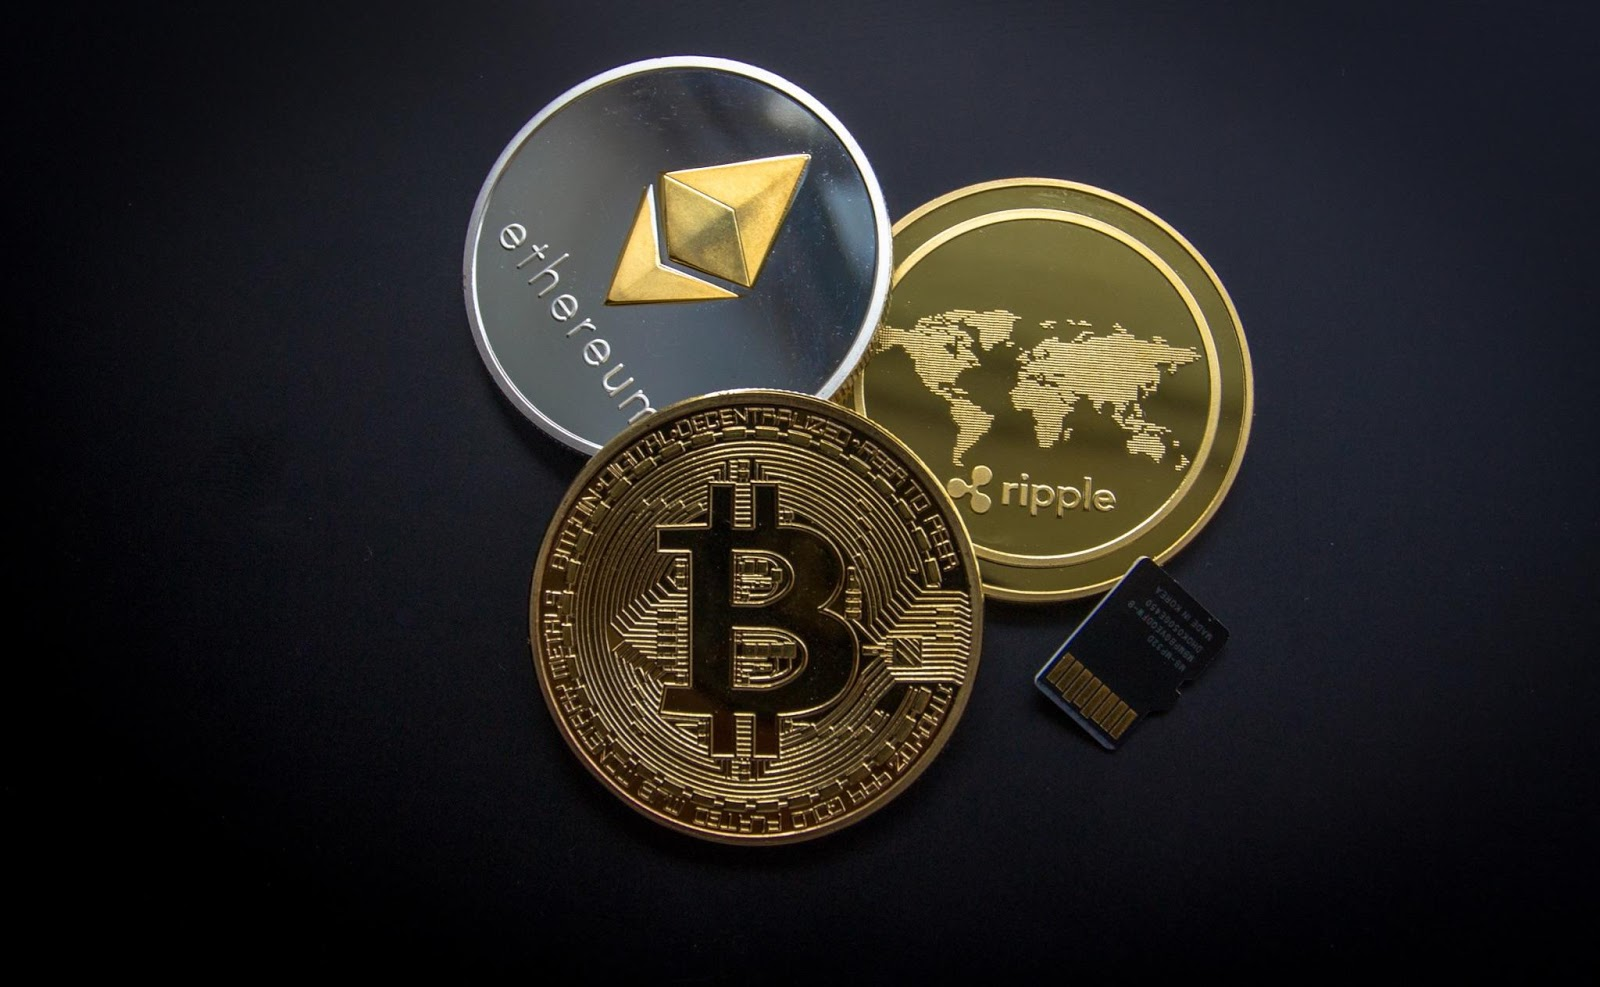 VPN bitcoin payments